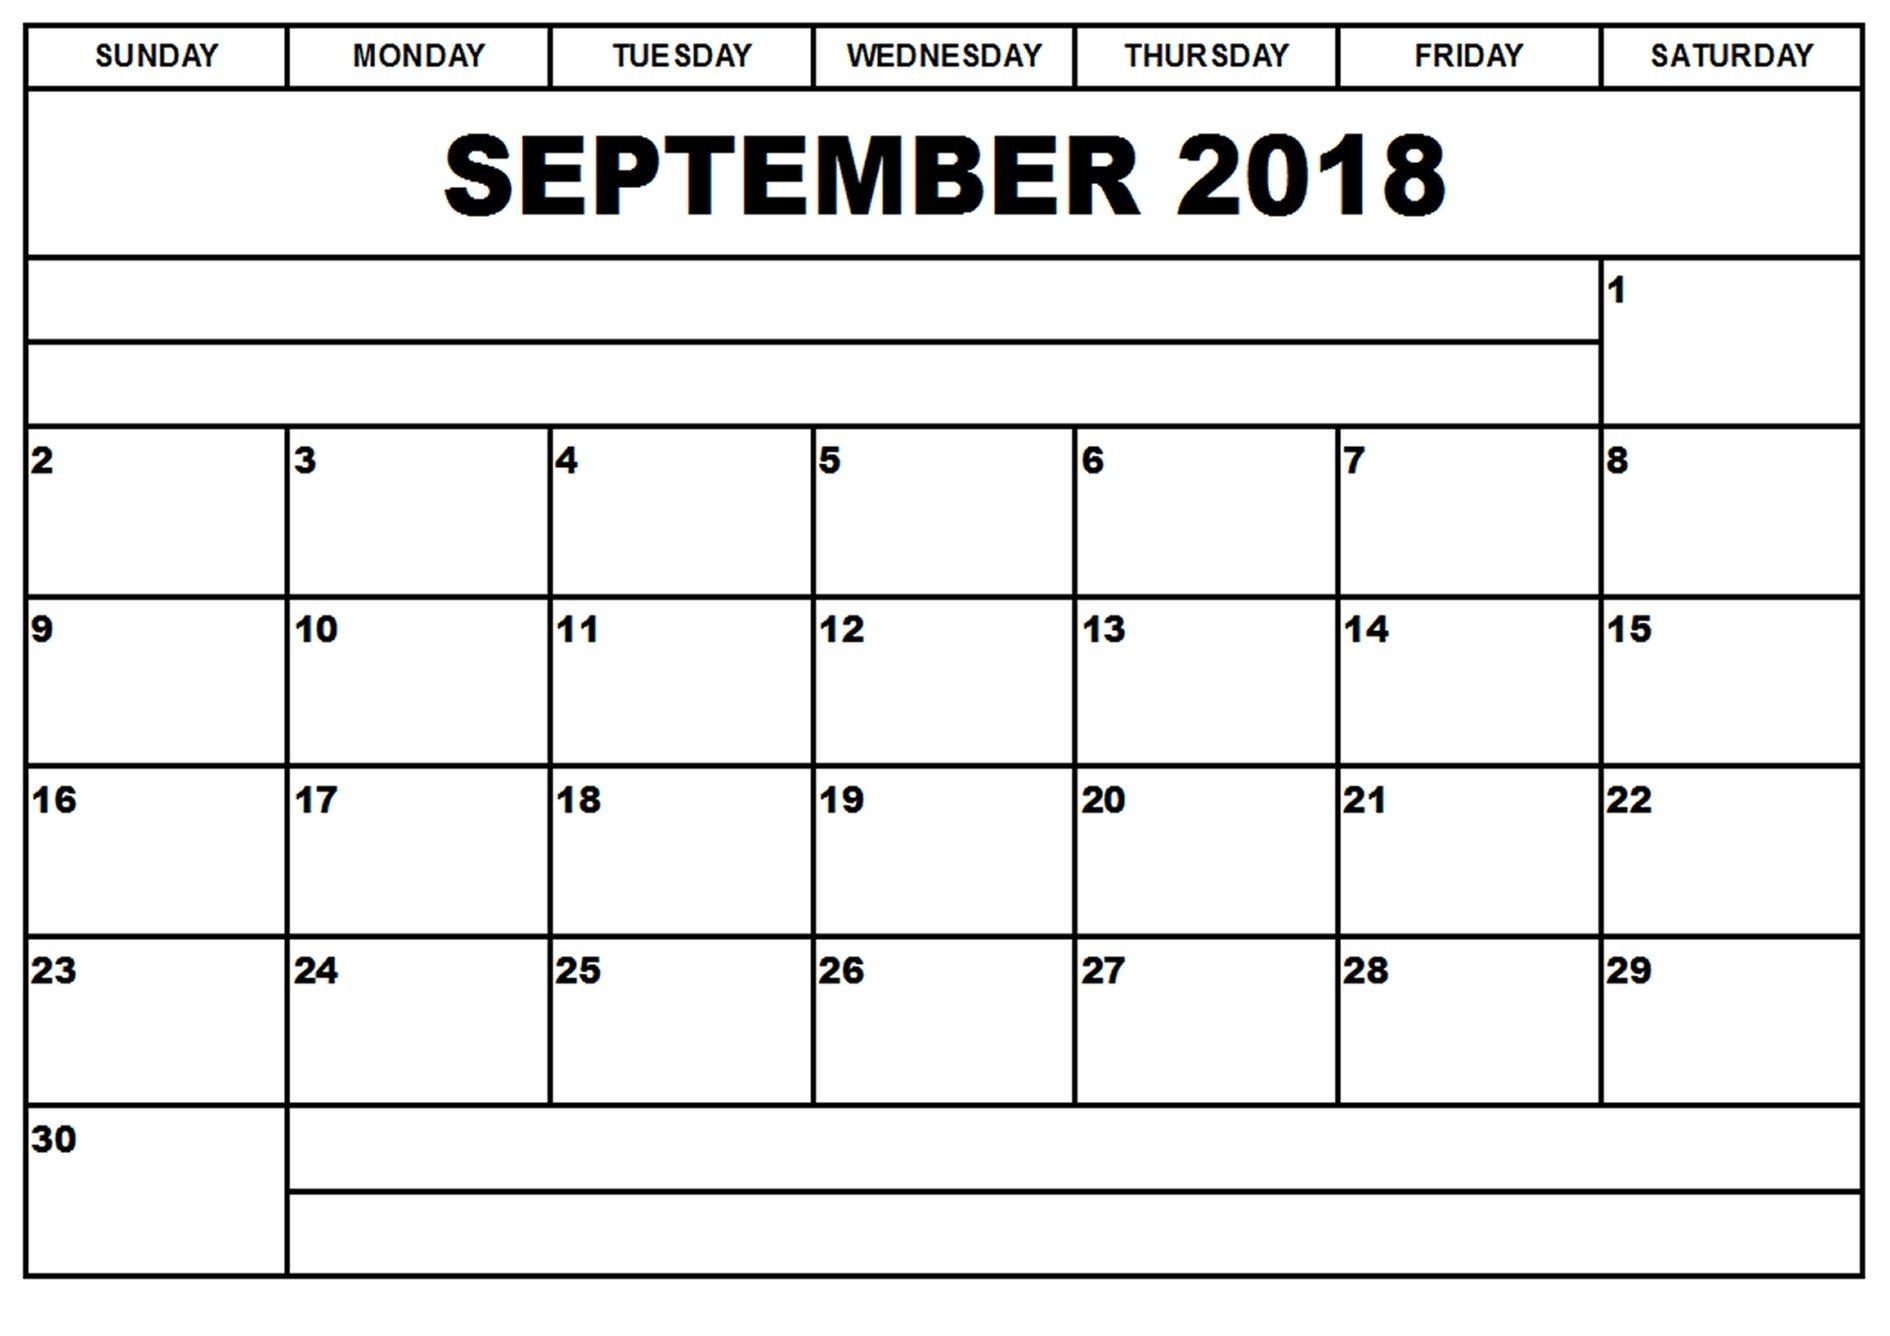 Printable Calendar Sunday Through Saturday In 2020 pertaining to Sunday Saturday Calendar